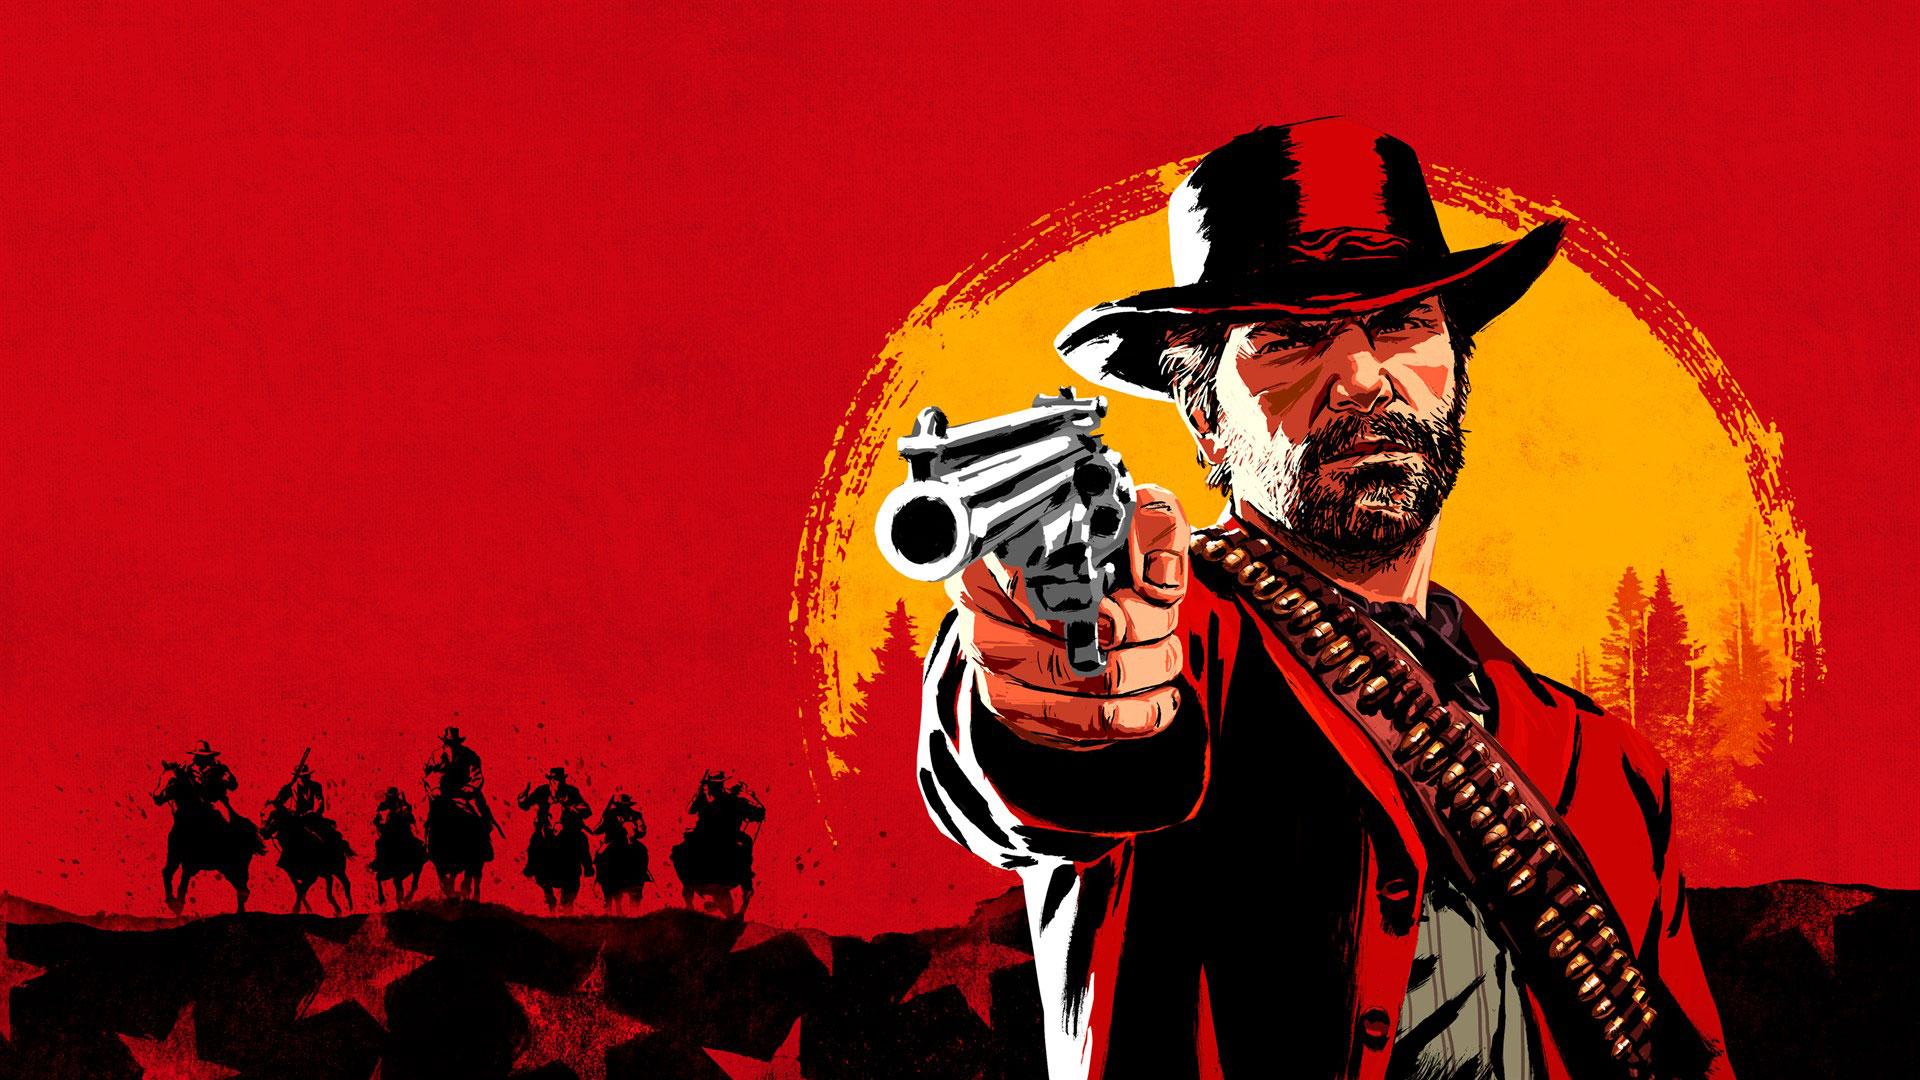 Red Dead Redemption 2 Banner, Core of a Game, coreofagame.com